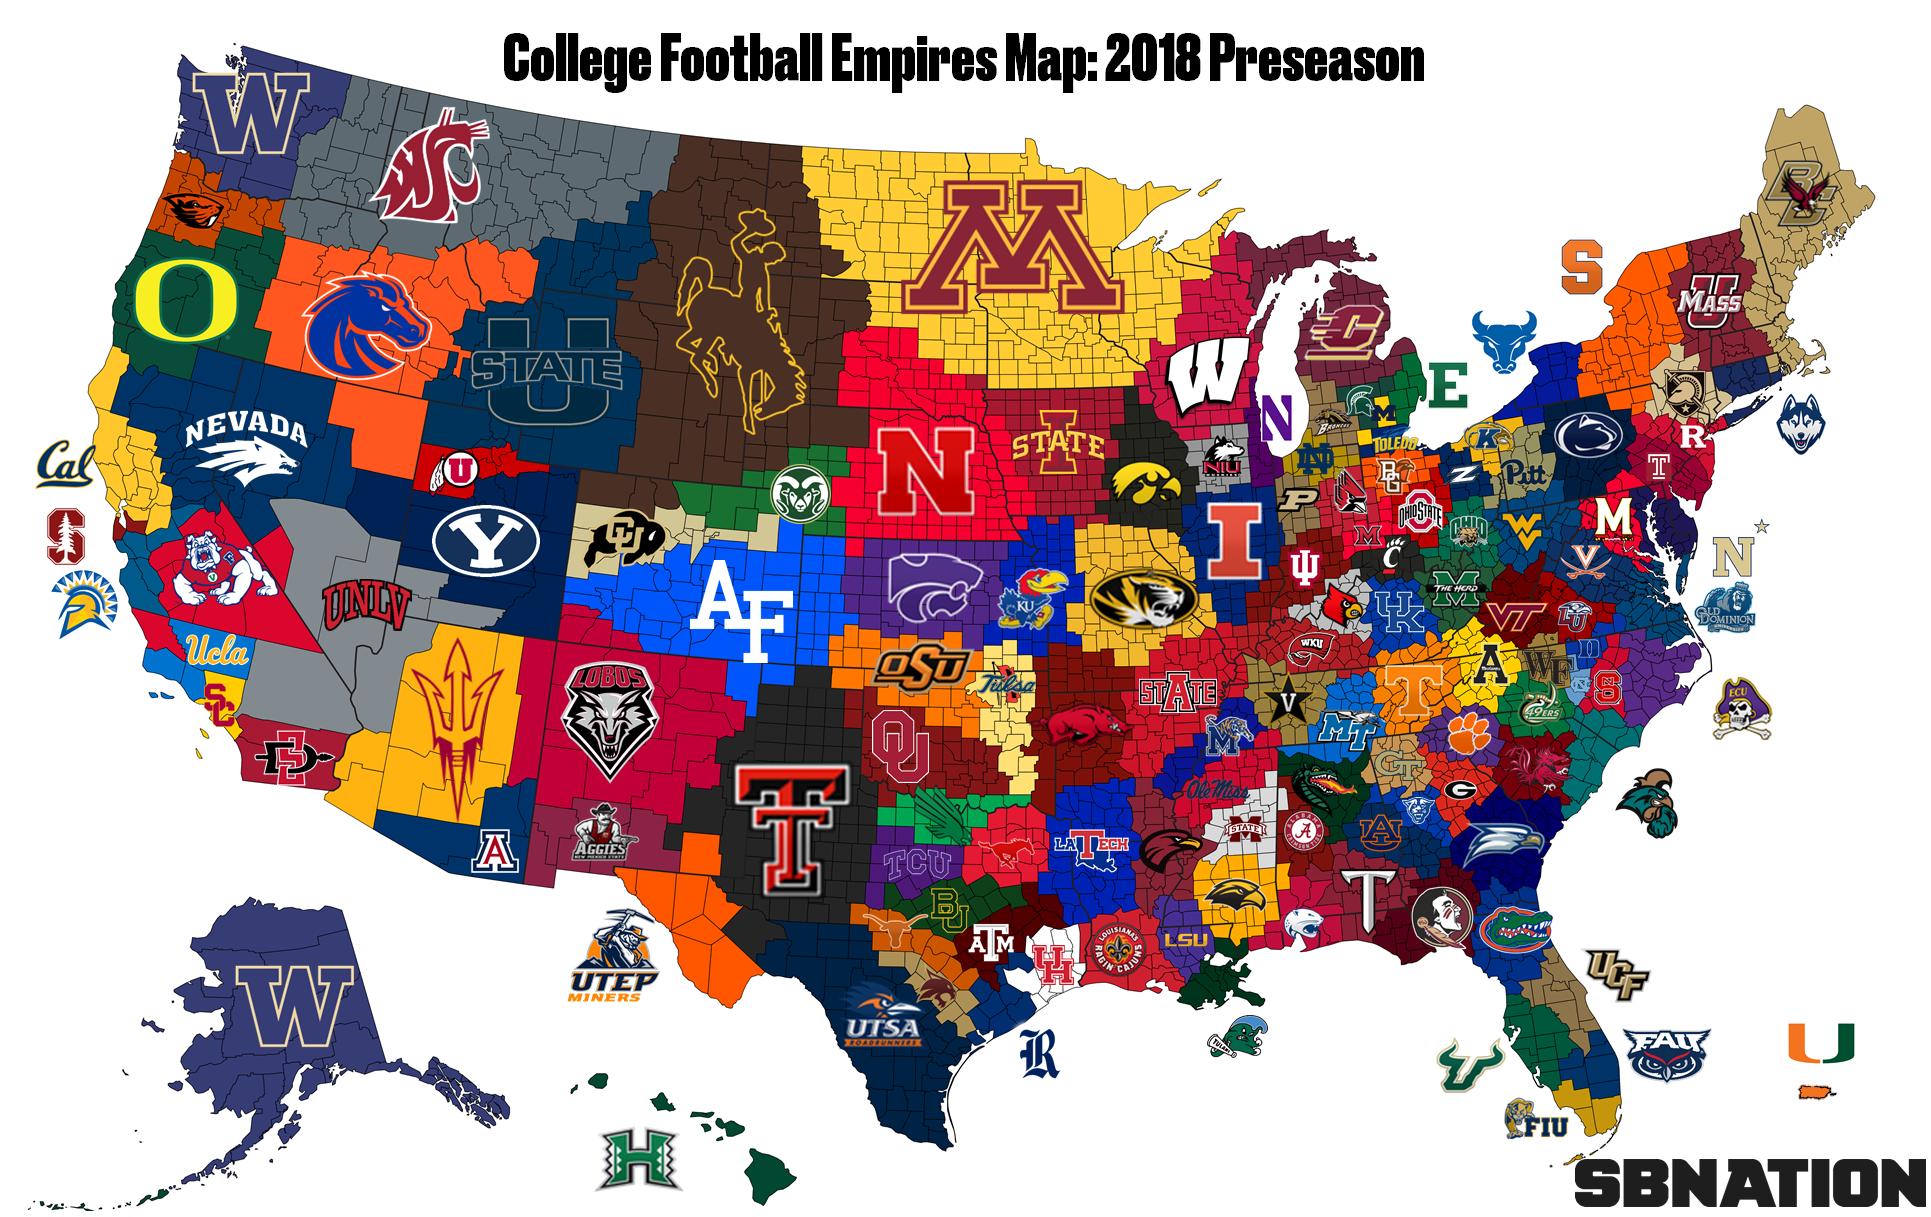 2018 College Football Empires Map Week 1 Sbnation Com College Football Map College Football Logos College Football